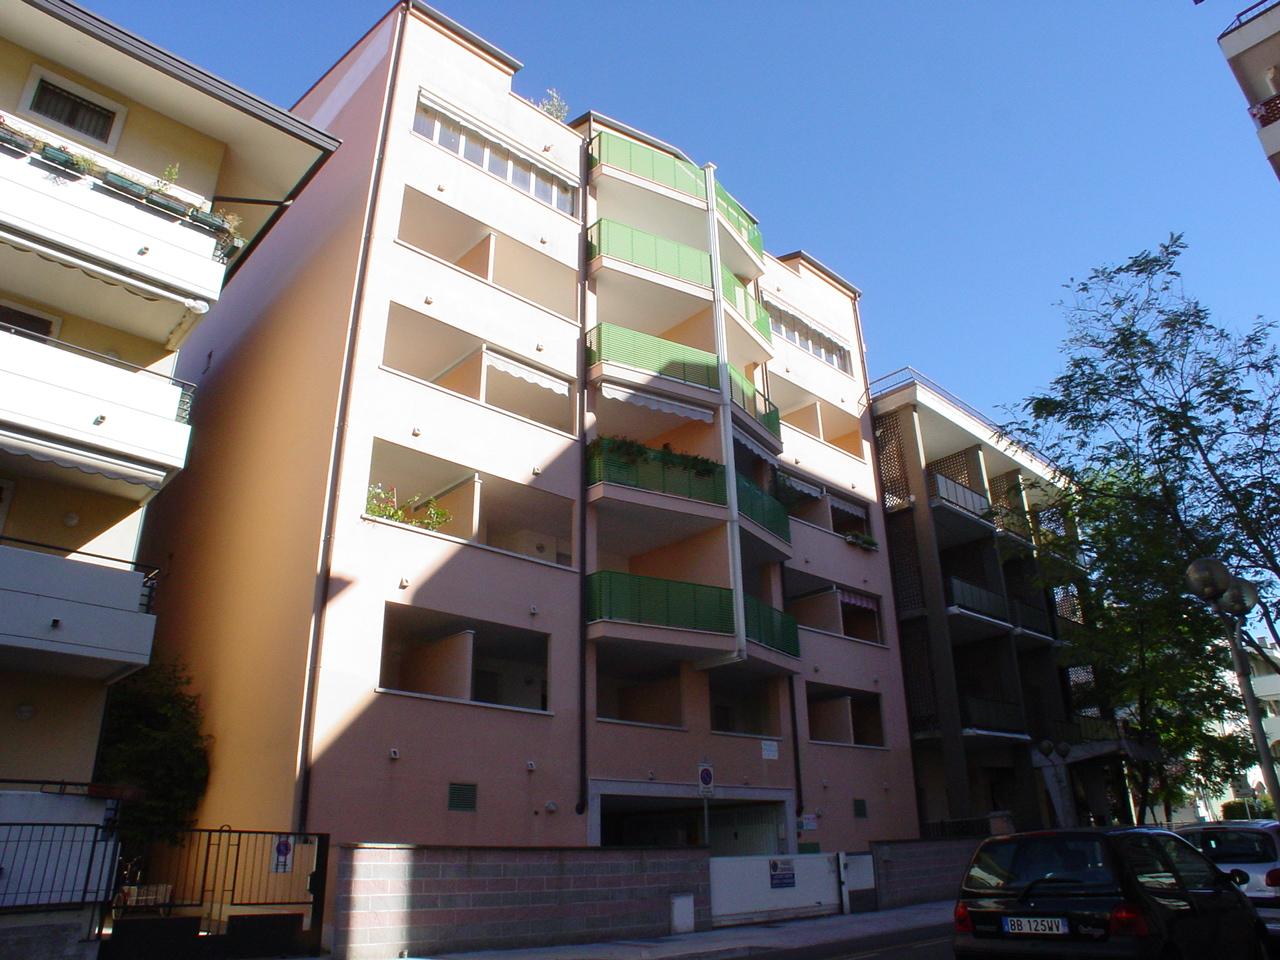 Appartamento Bilocale a Grado - 01